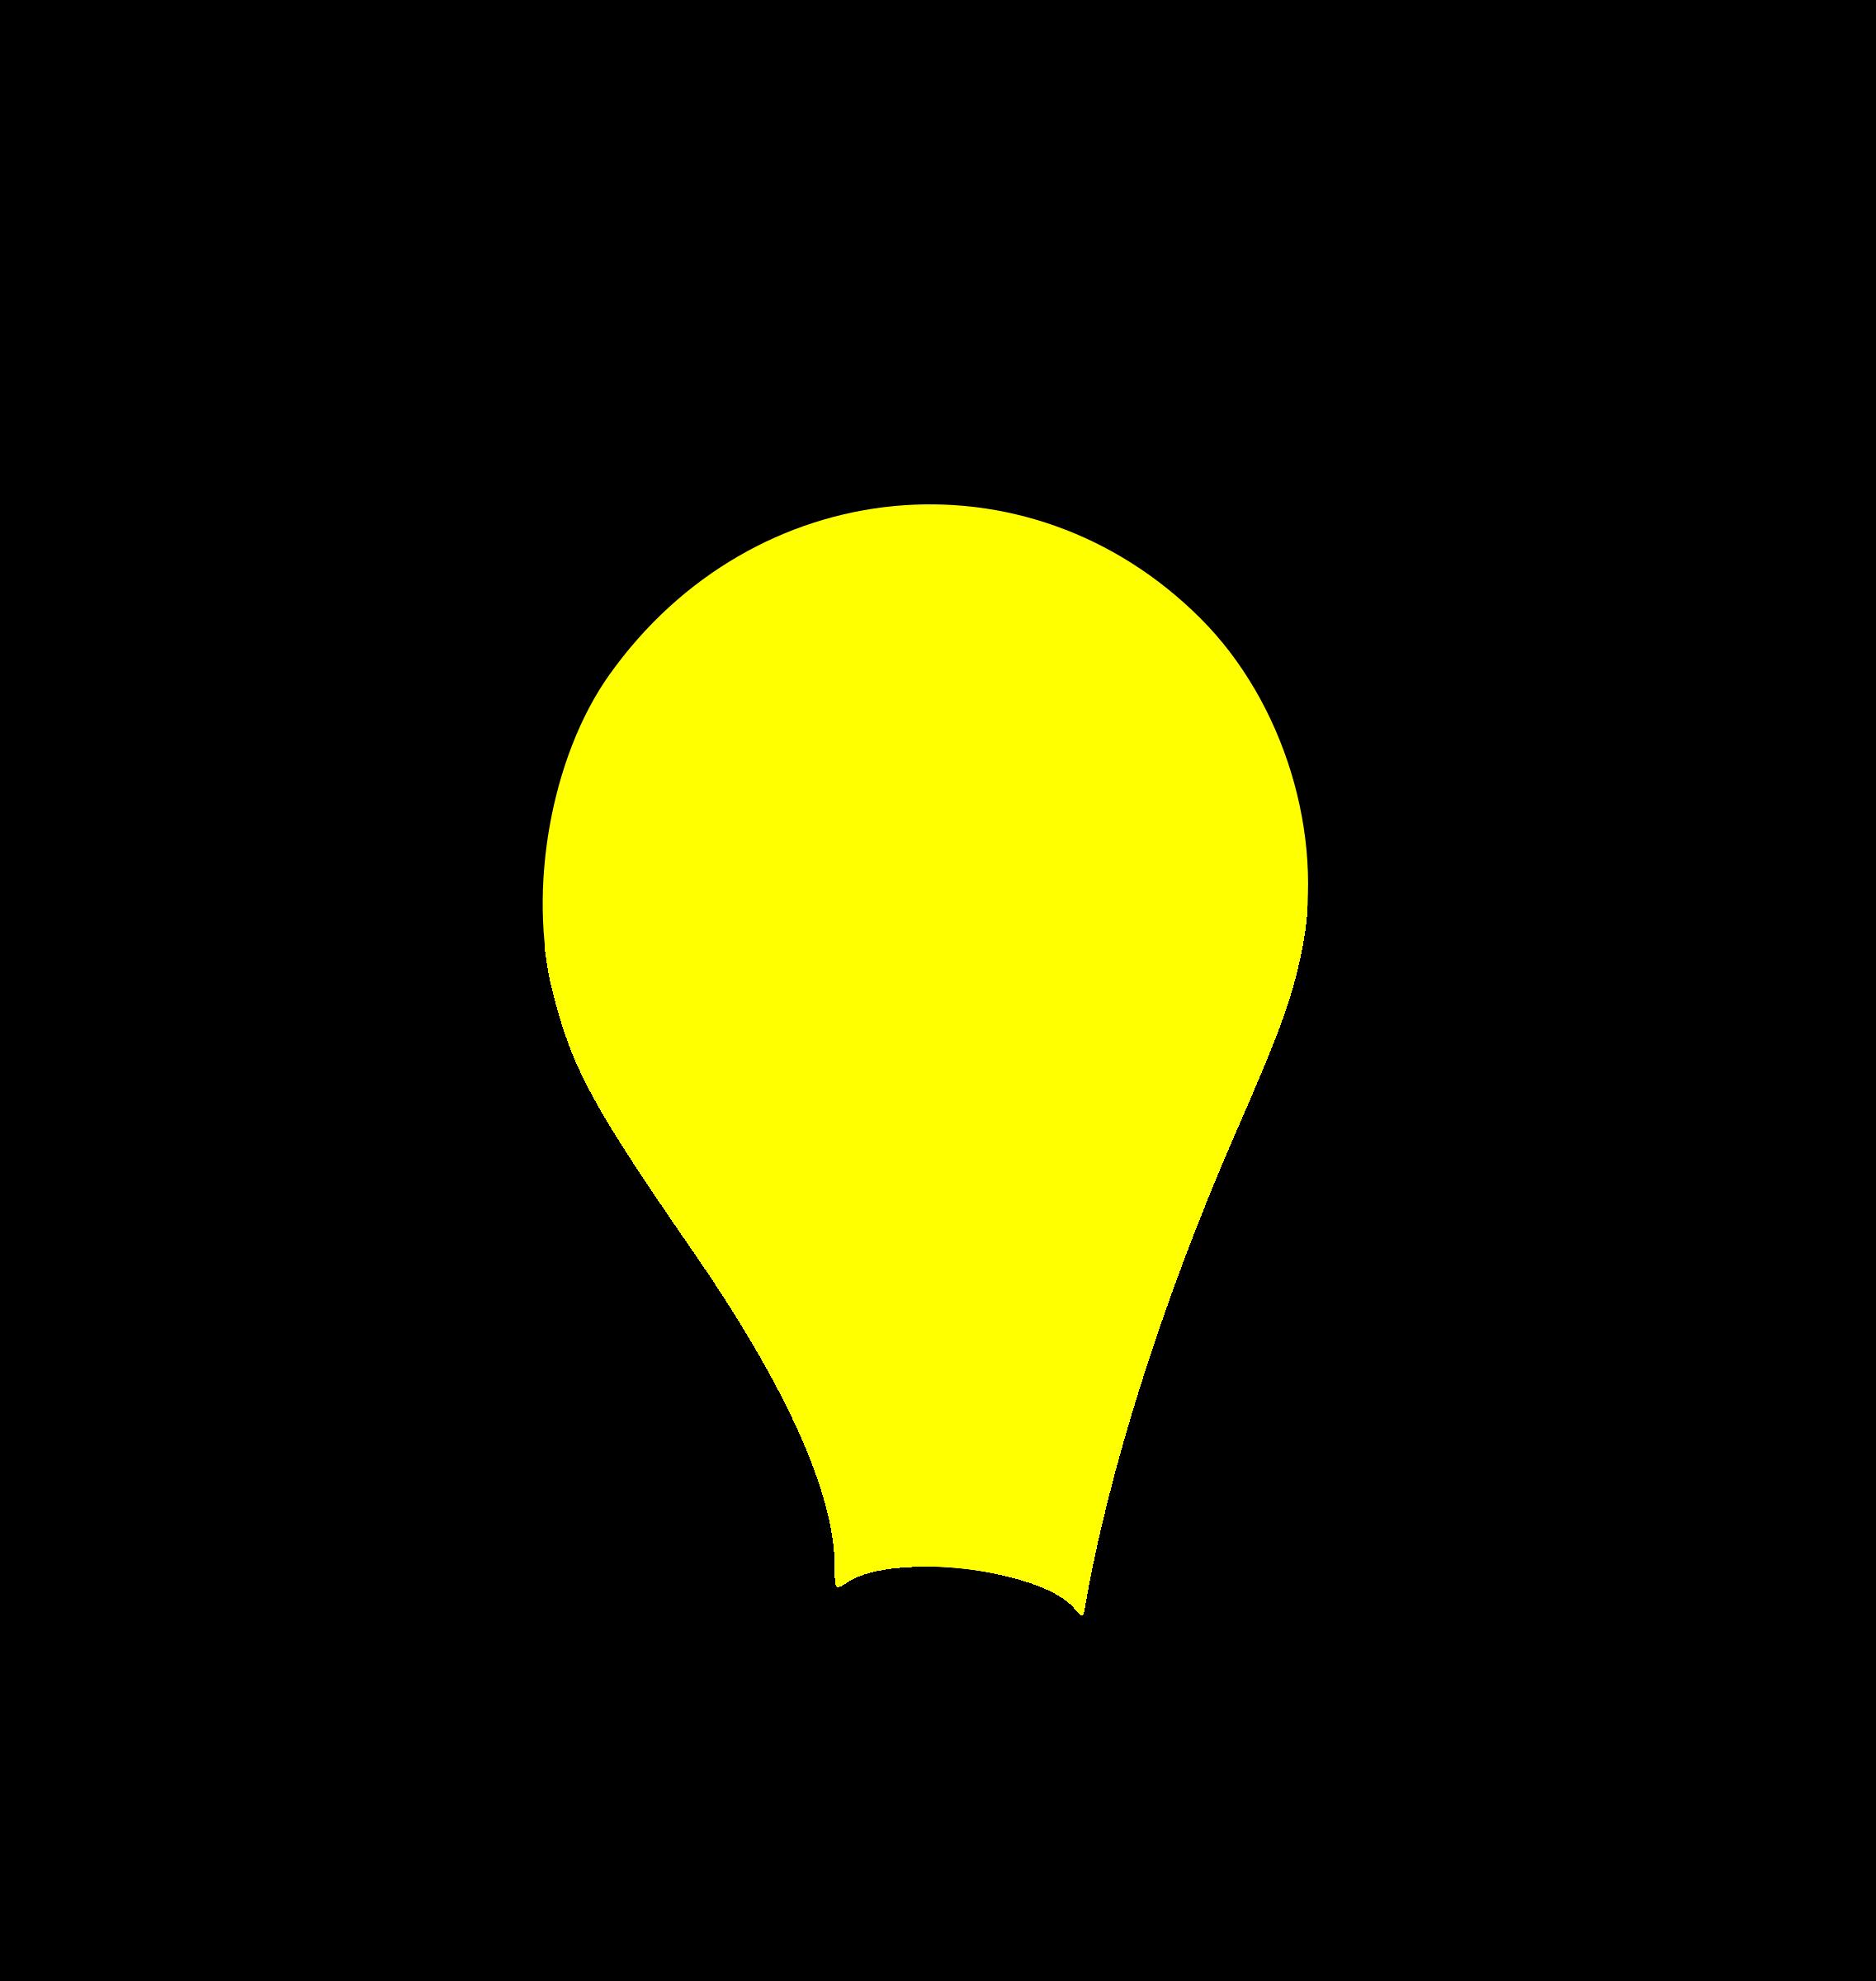 Light bulb cartoon. Challenge clipart free download